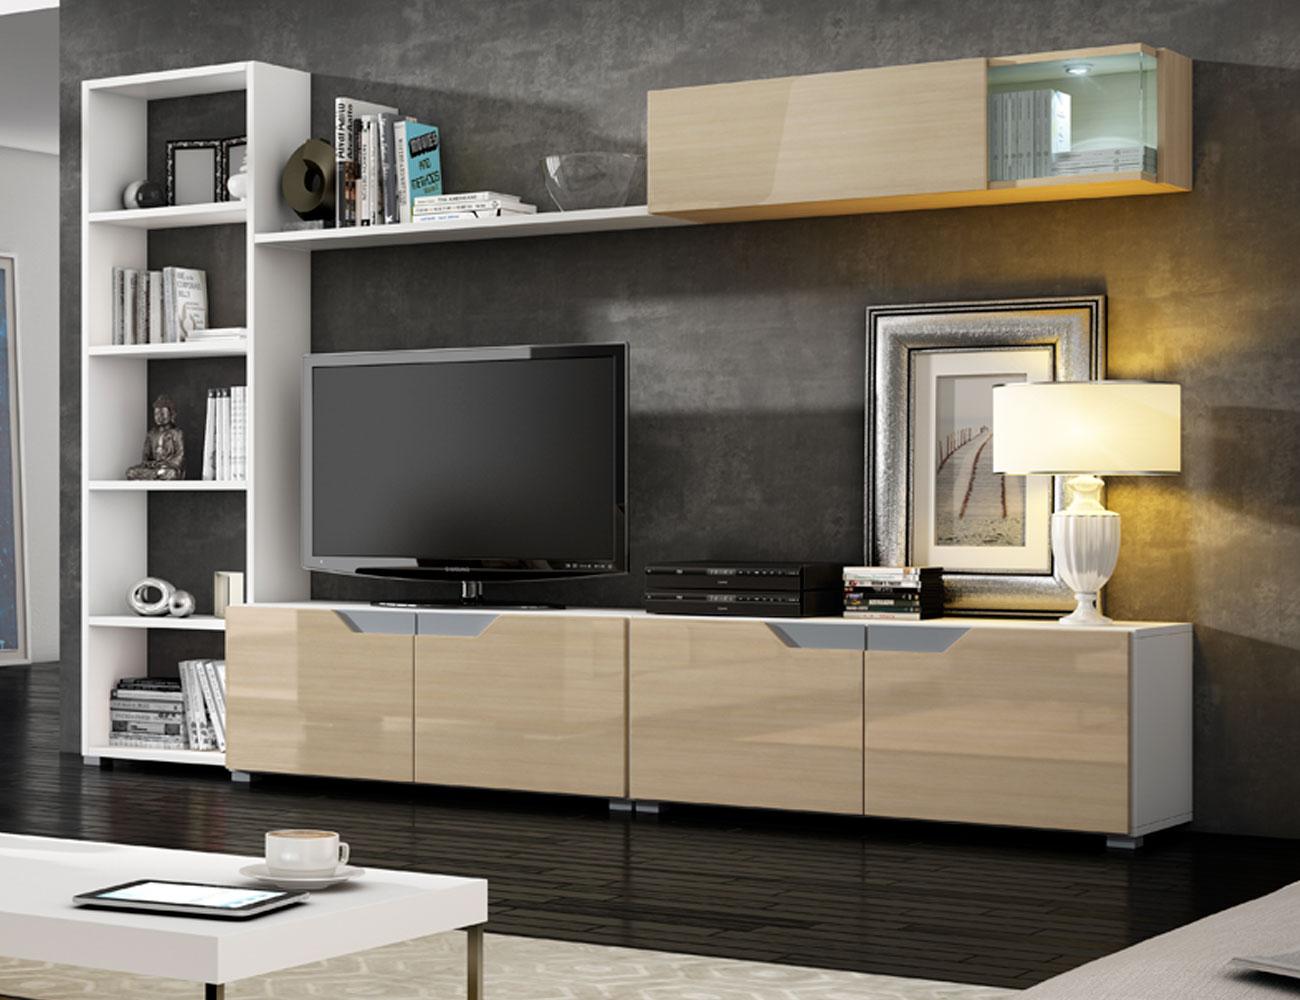 03 mueble salon comedor vitrina estanteria blanco artico arava